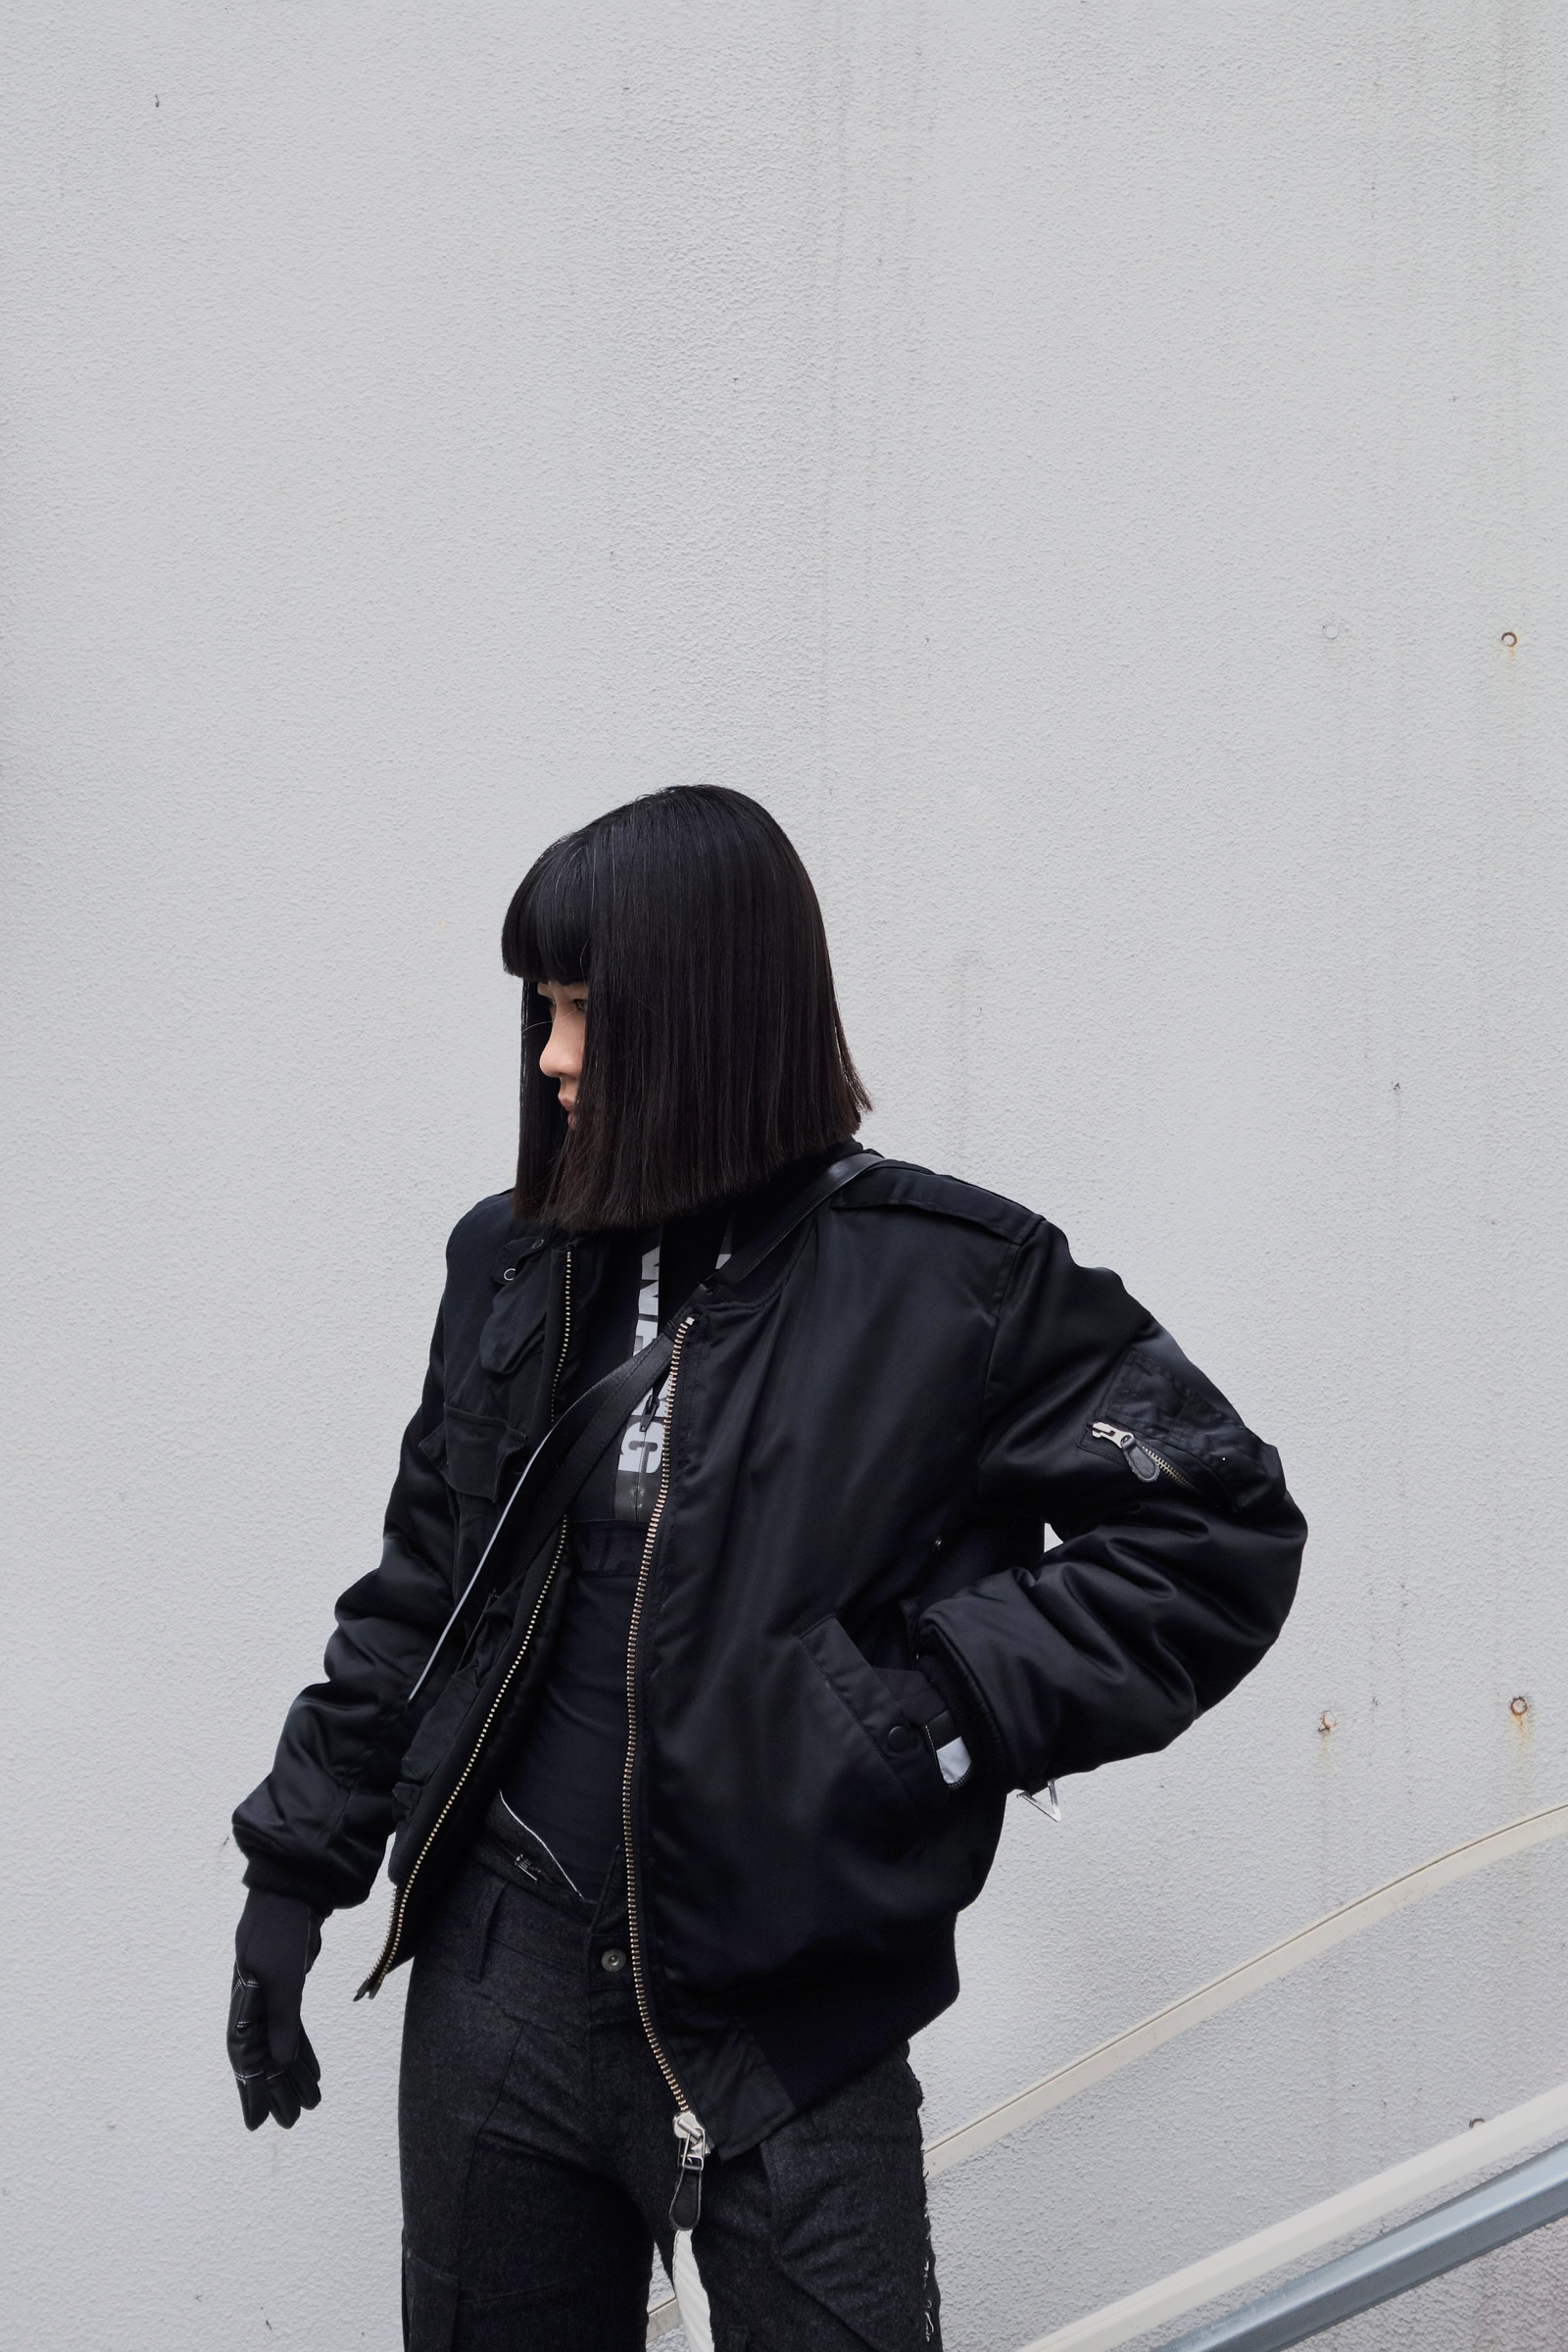 Vandalize Undercover Bomber Jacket